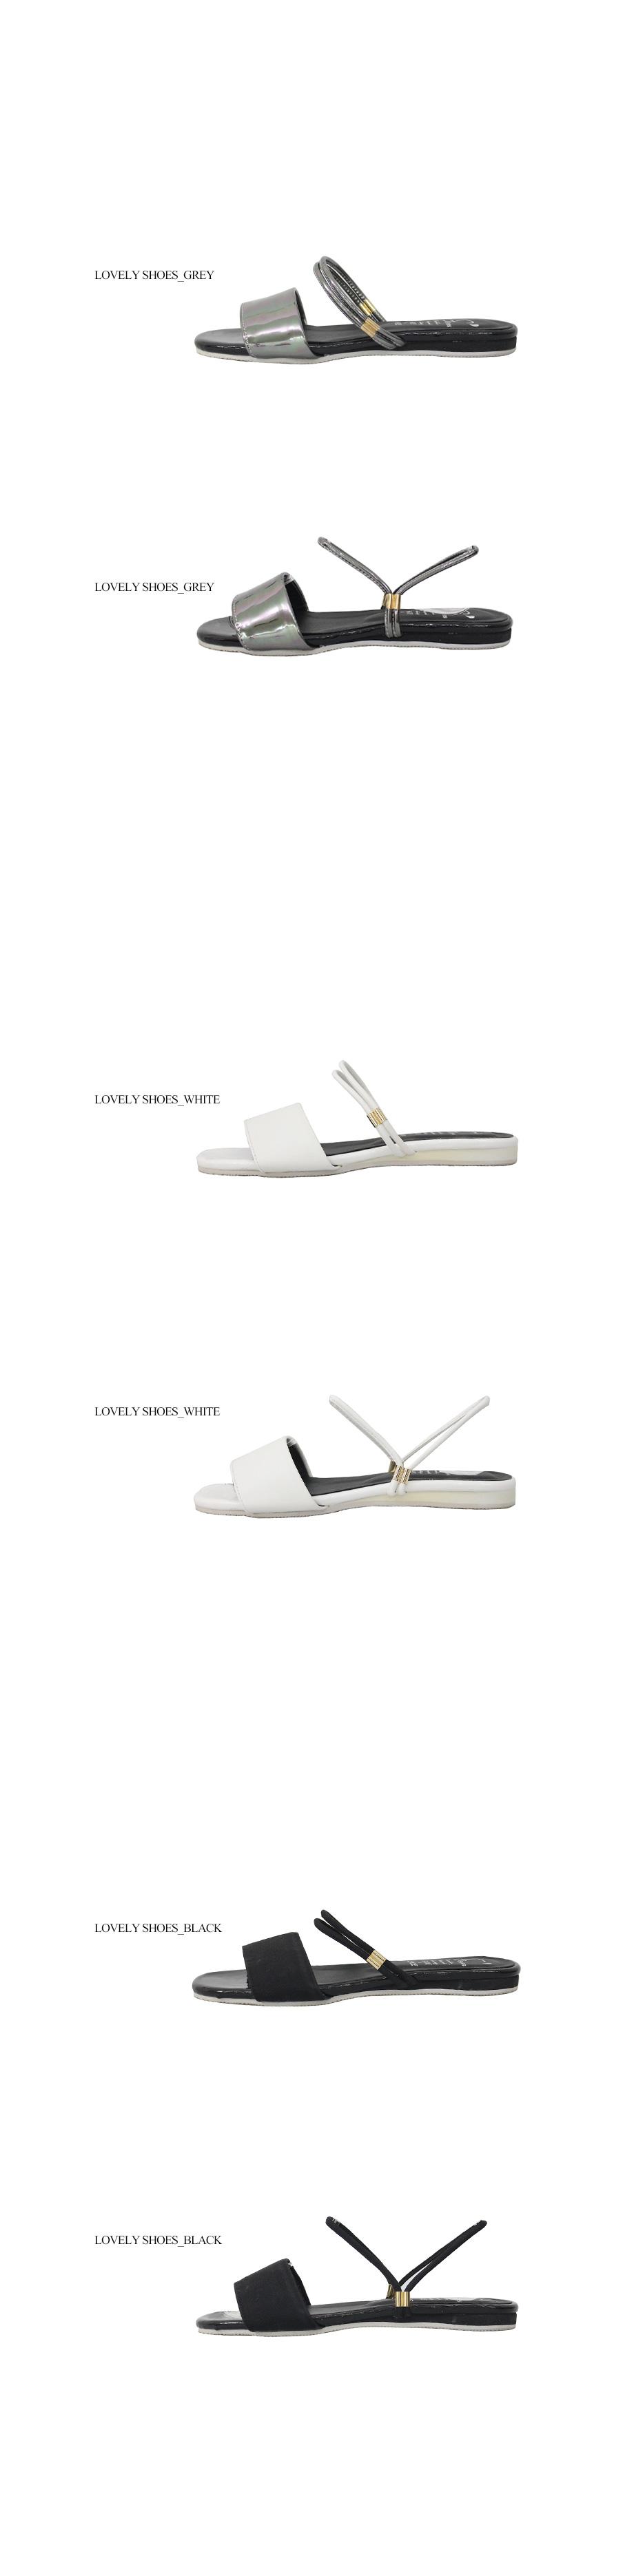 Beige Strap Sandals & Mules 2cm